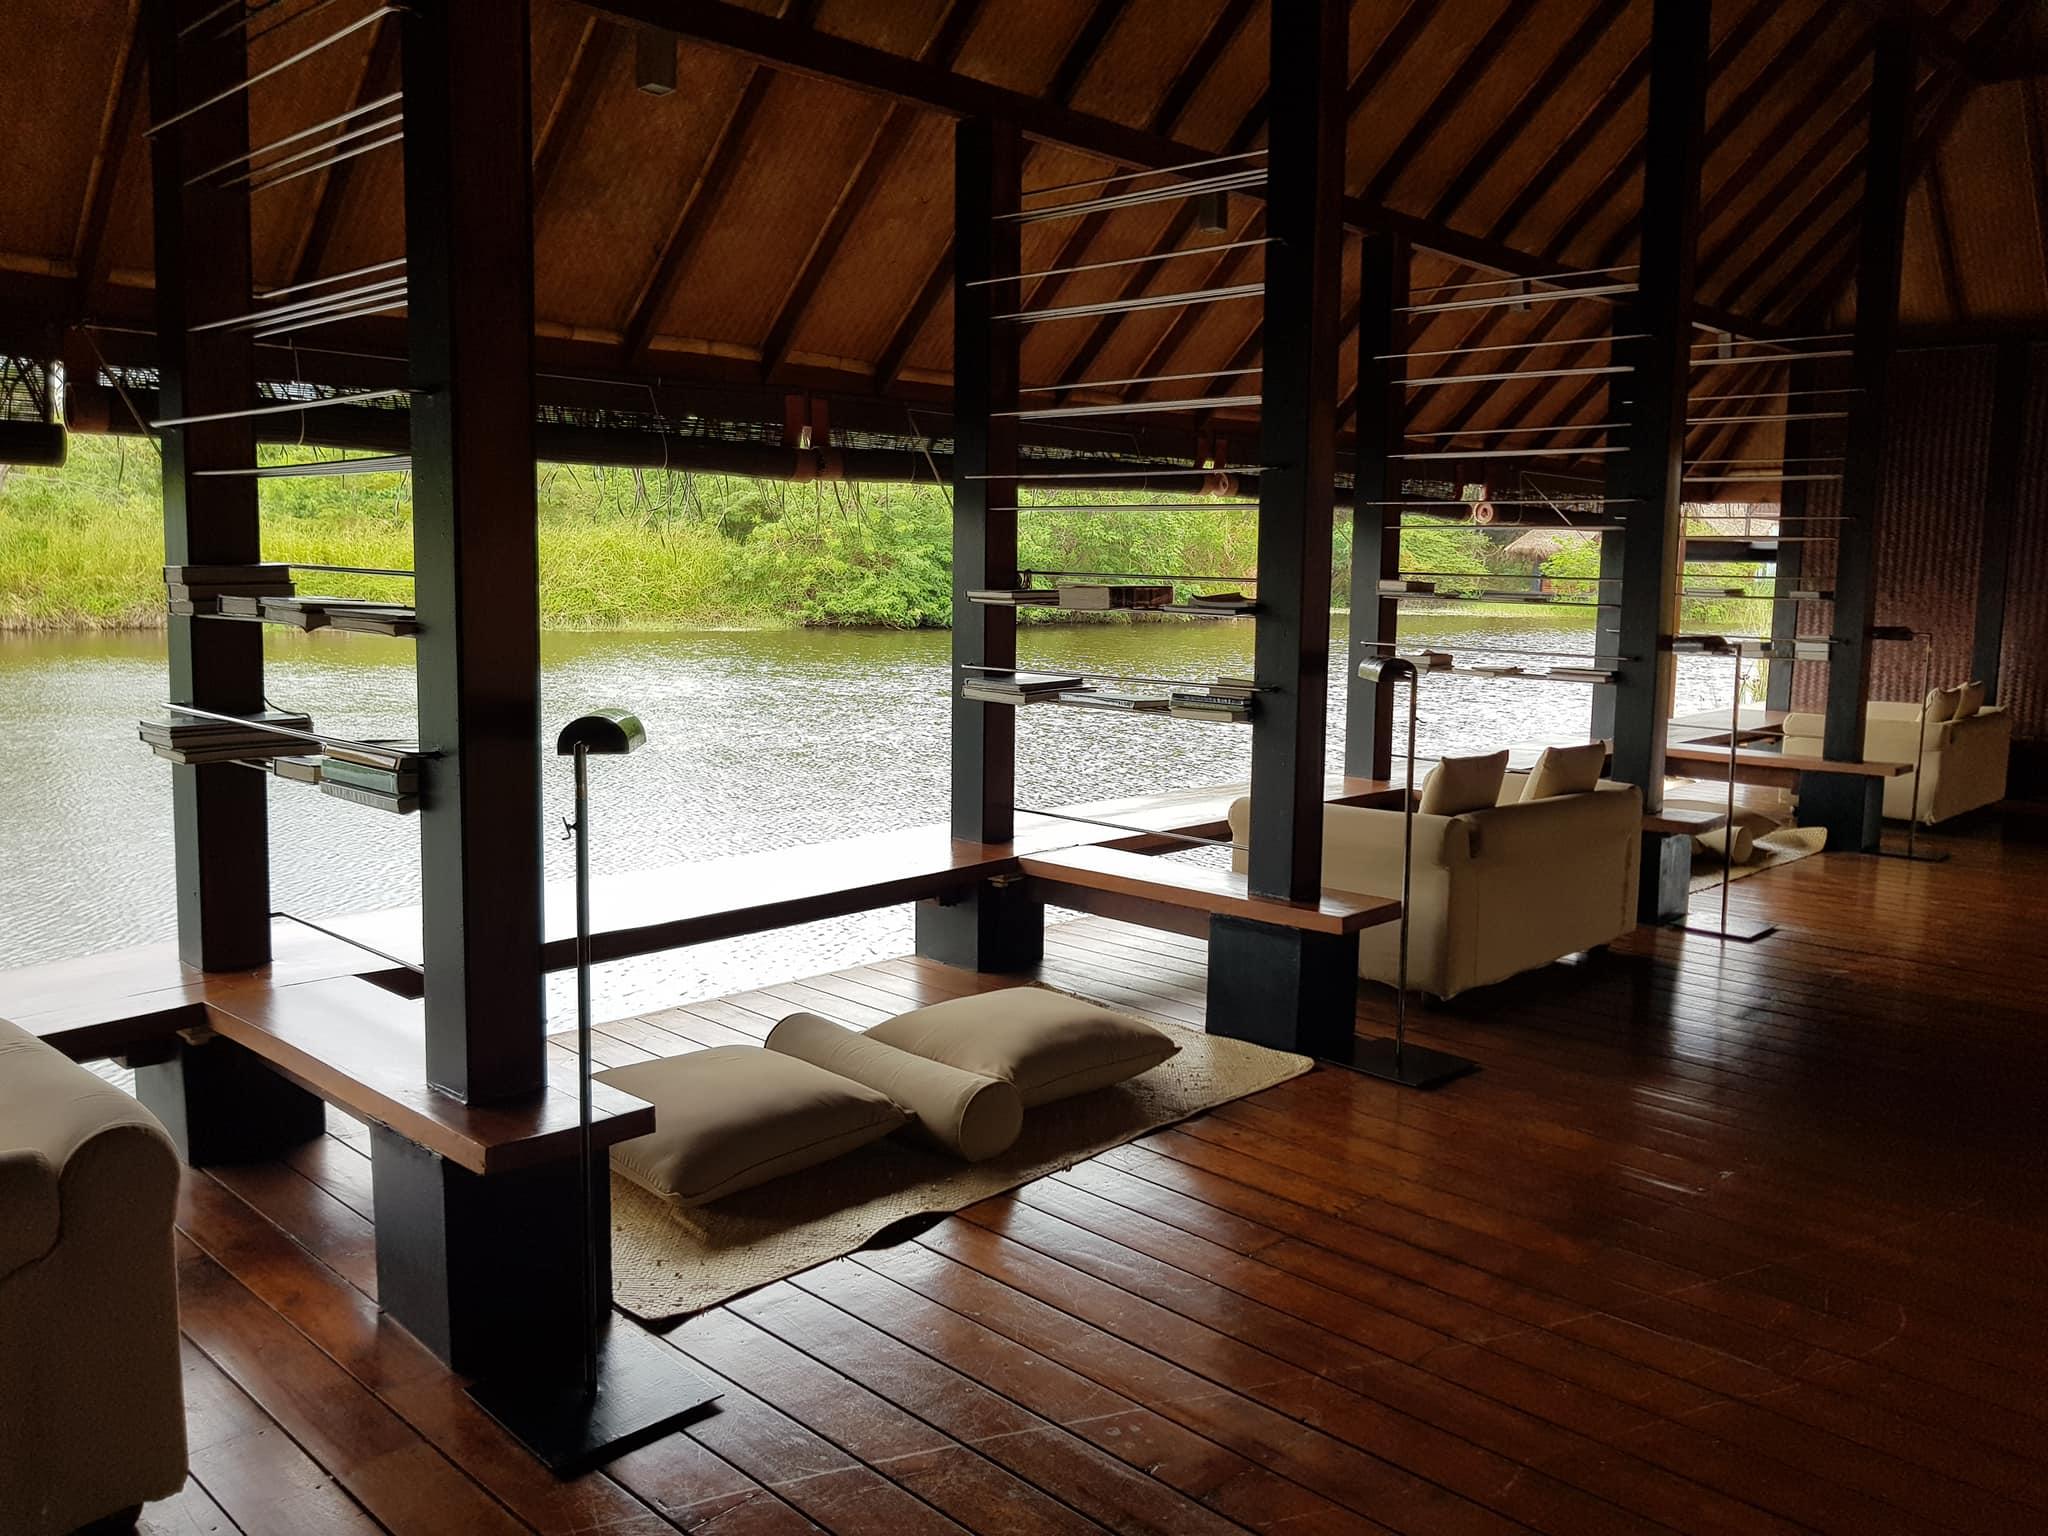 invite-to-paradise-sri-lanka-maldives-holiday-honeymoon-specialists-customer-guest-feedback-zane-lisa-butcher-jetwing-vil-uyana-library-water.jpg